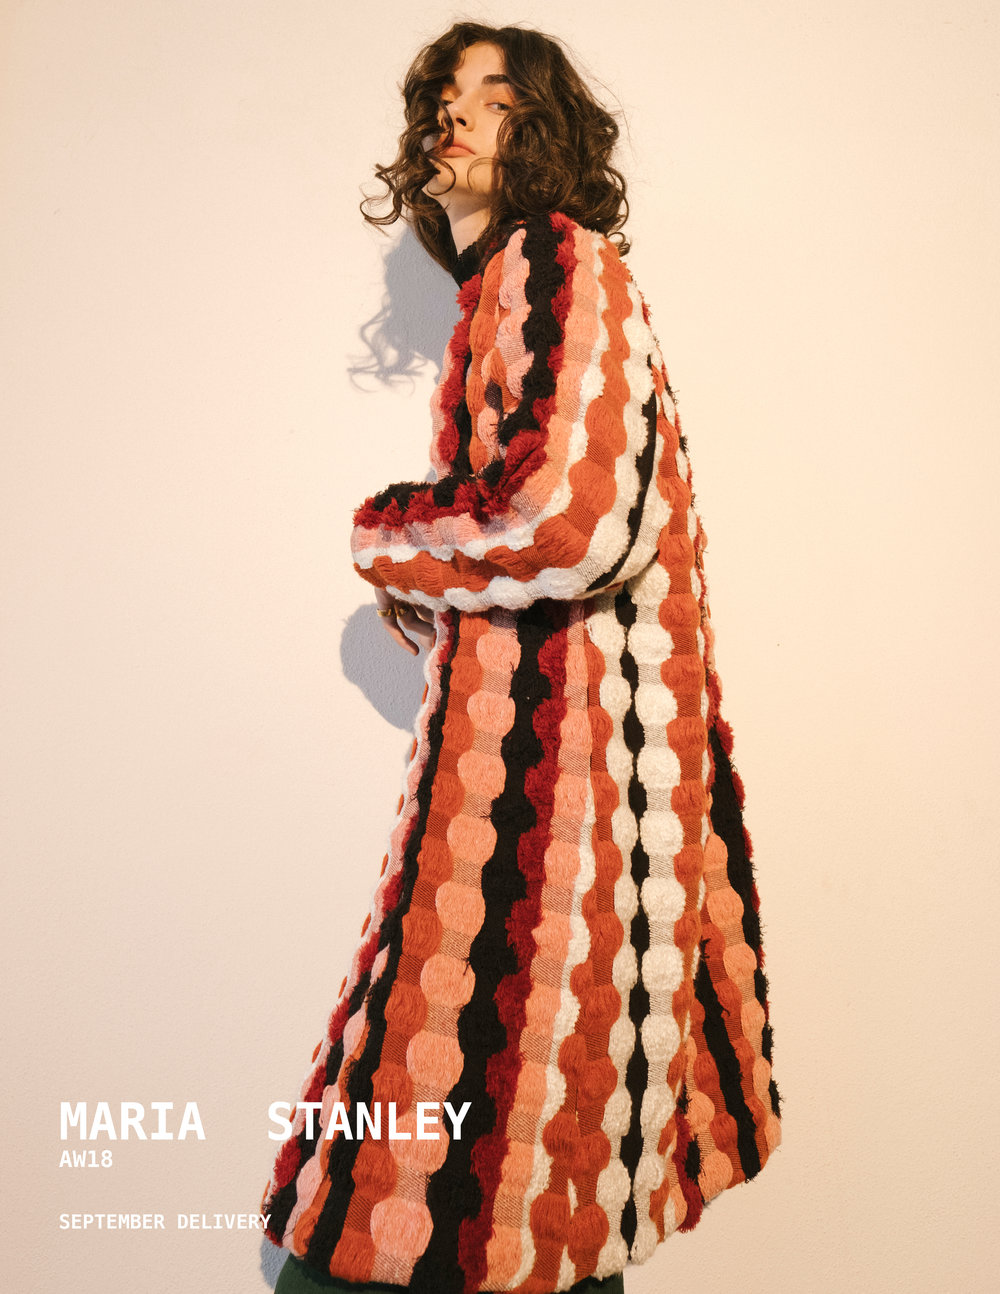 Maria Stanley AW18 Line Sheets - PRINT8.jpg